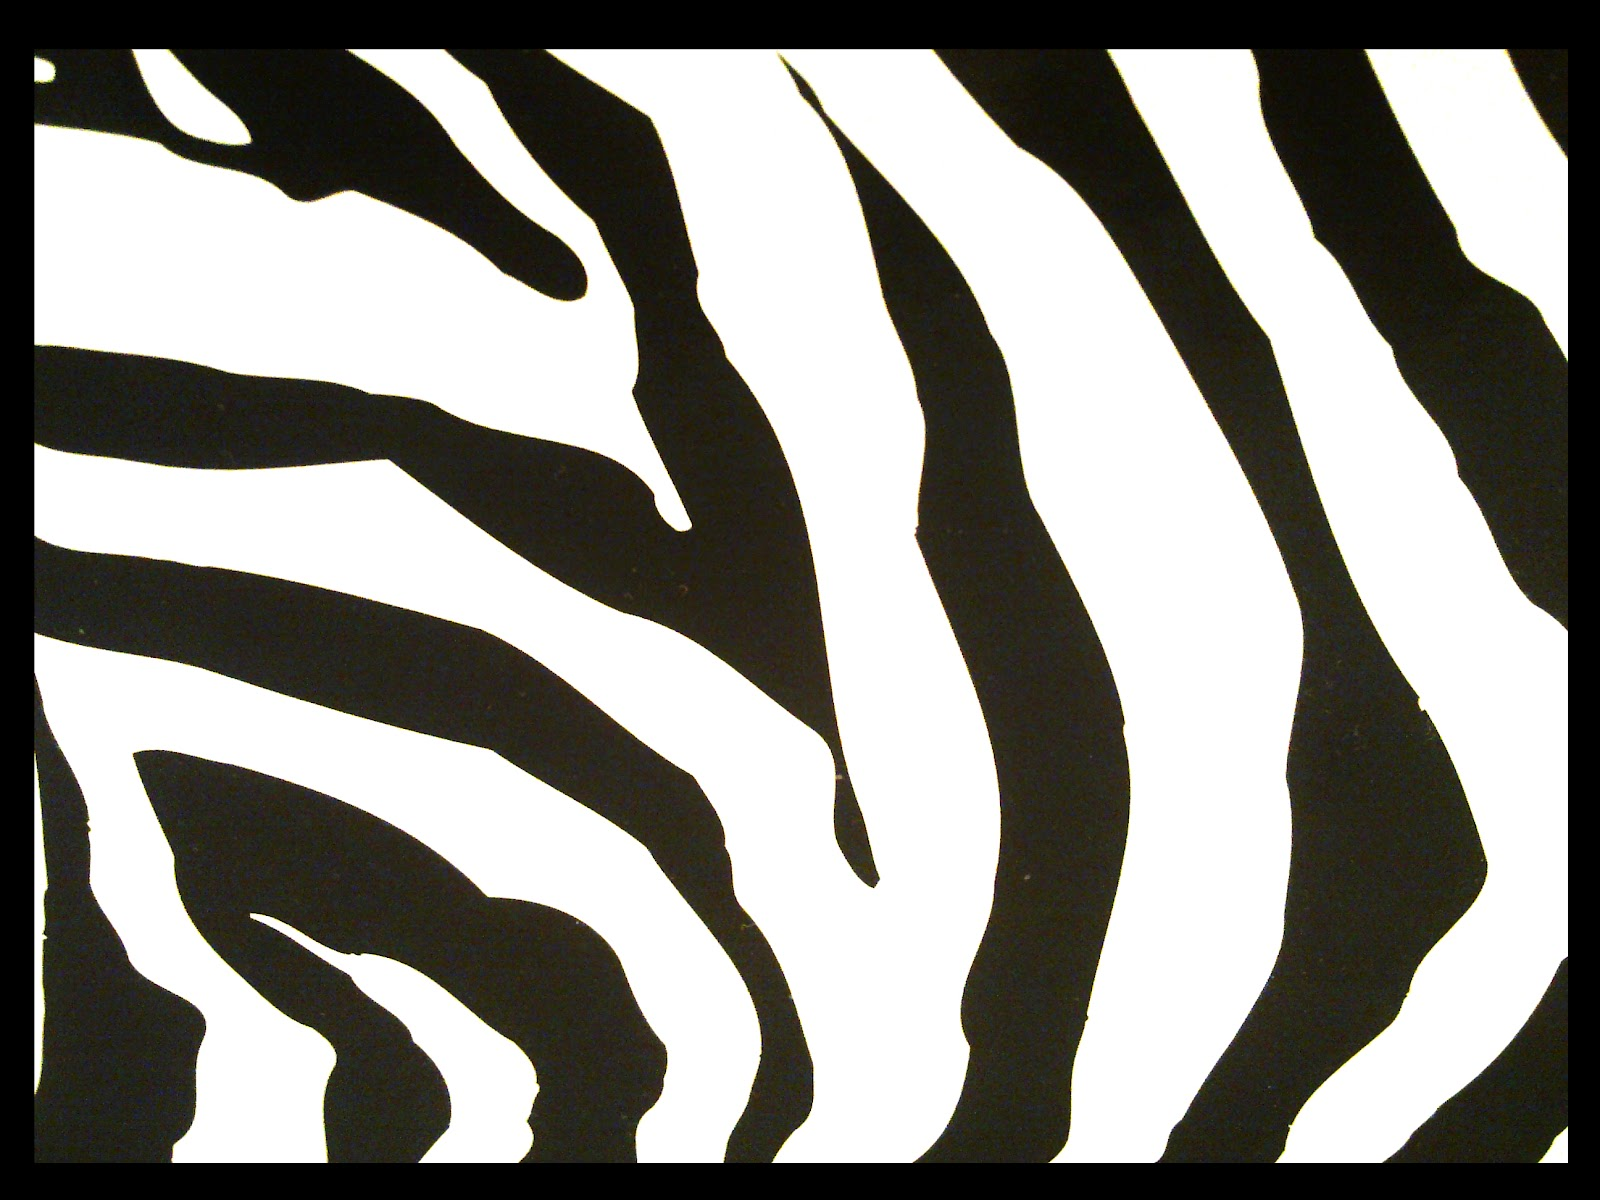 Zebra Stripes Pattern Printable